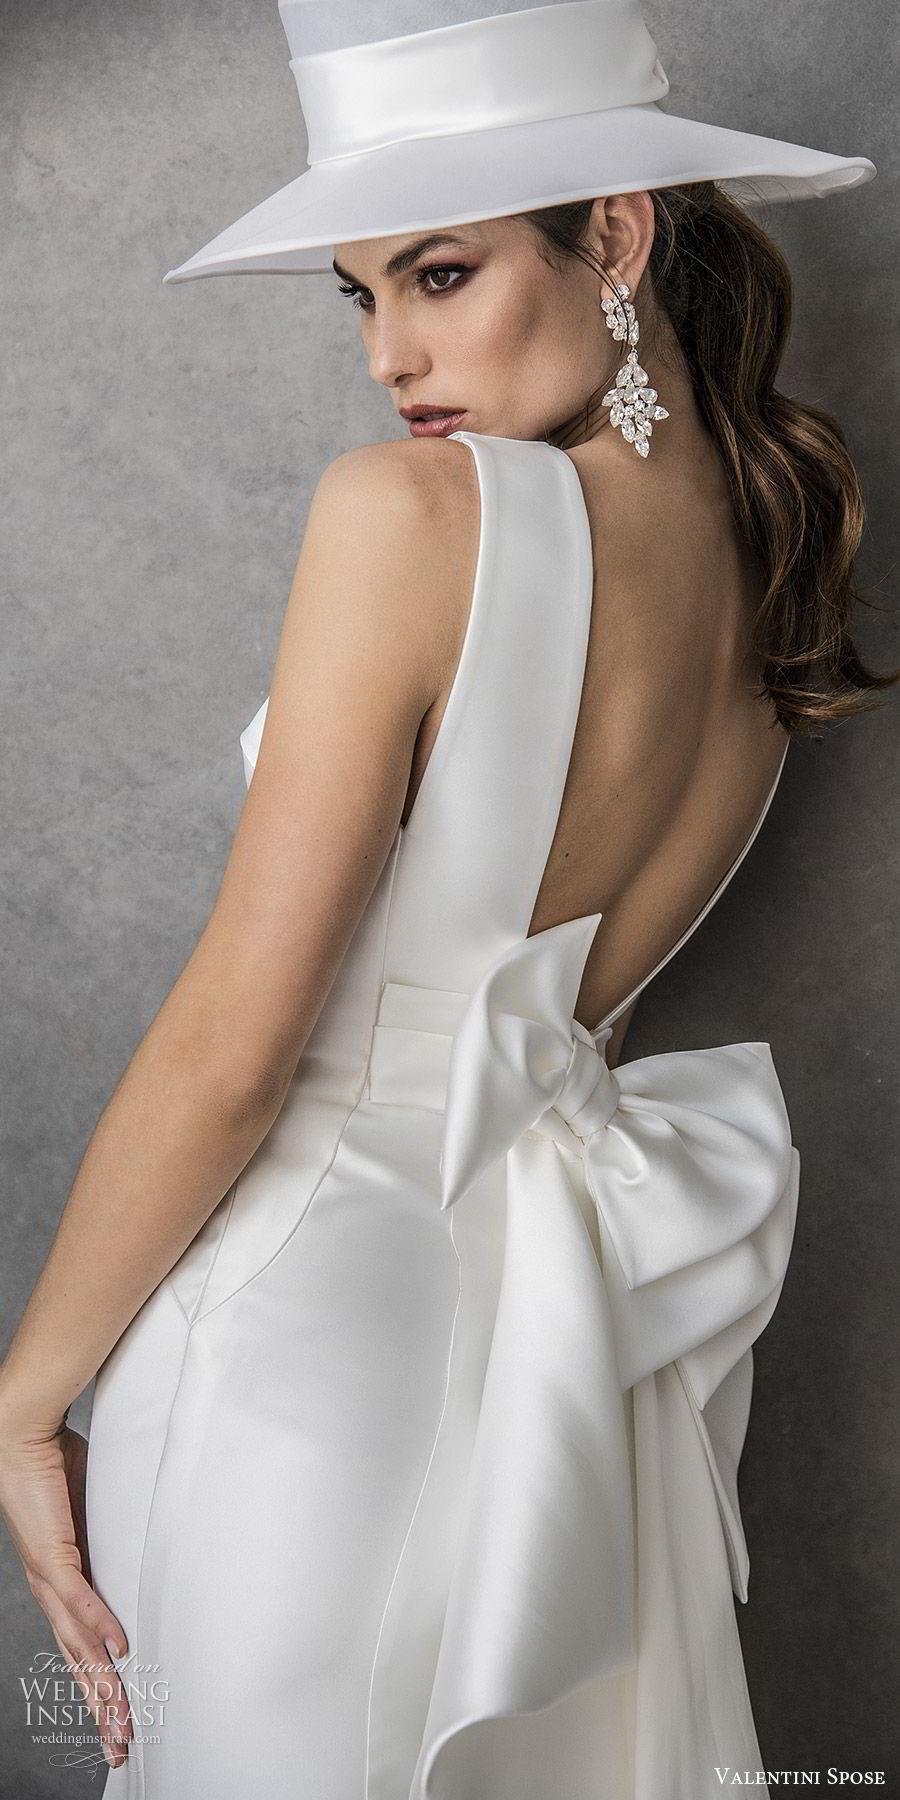 valentini spose spring 2020 bridal sleeveless thick straps v neckline sheath wedding dress (21) minimal clean chic hat low back bow mv